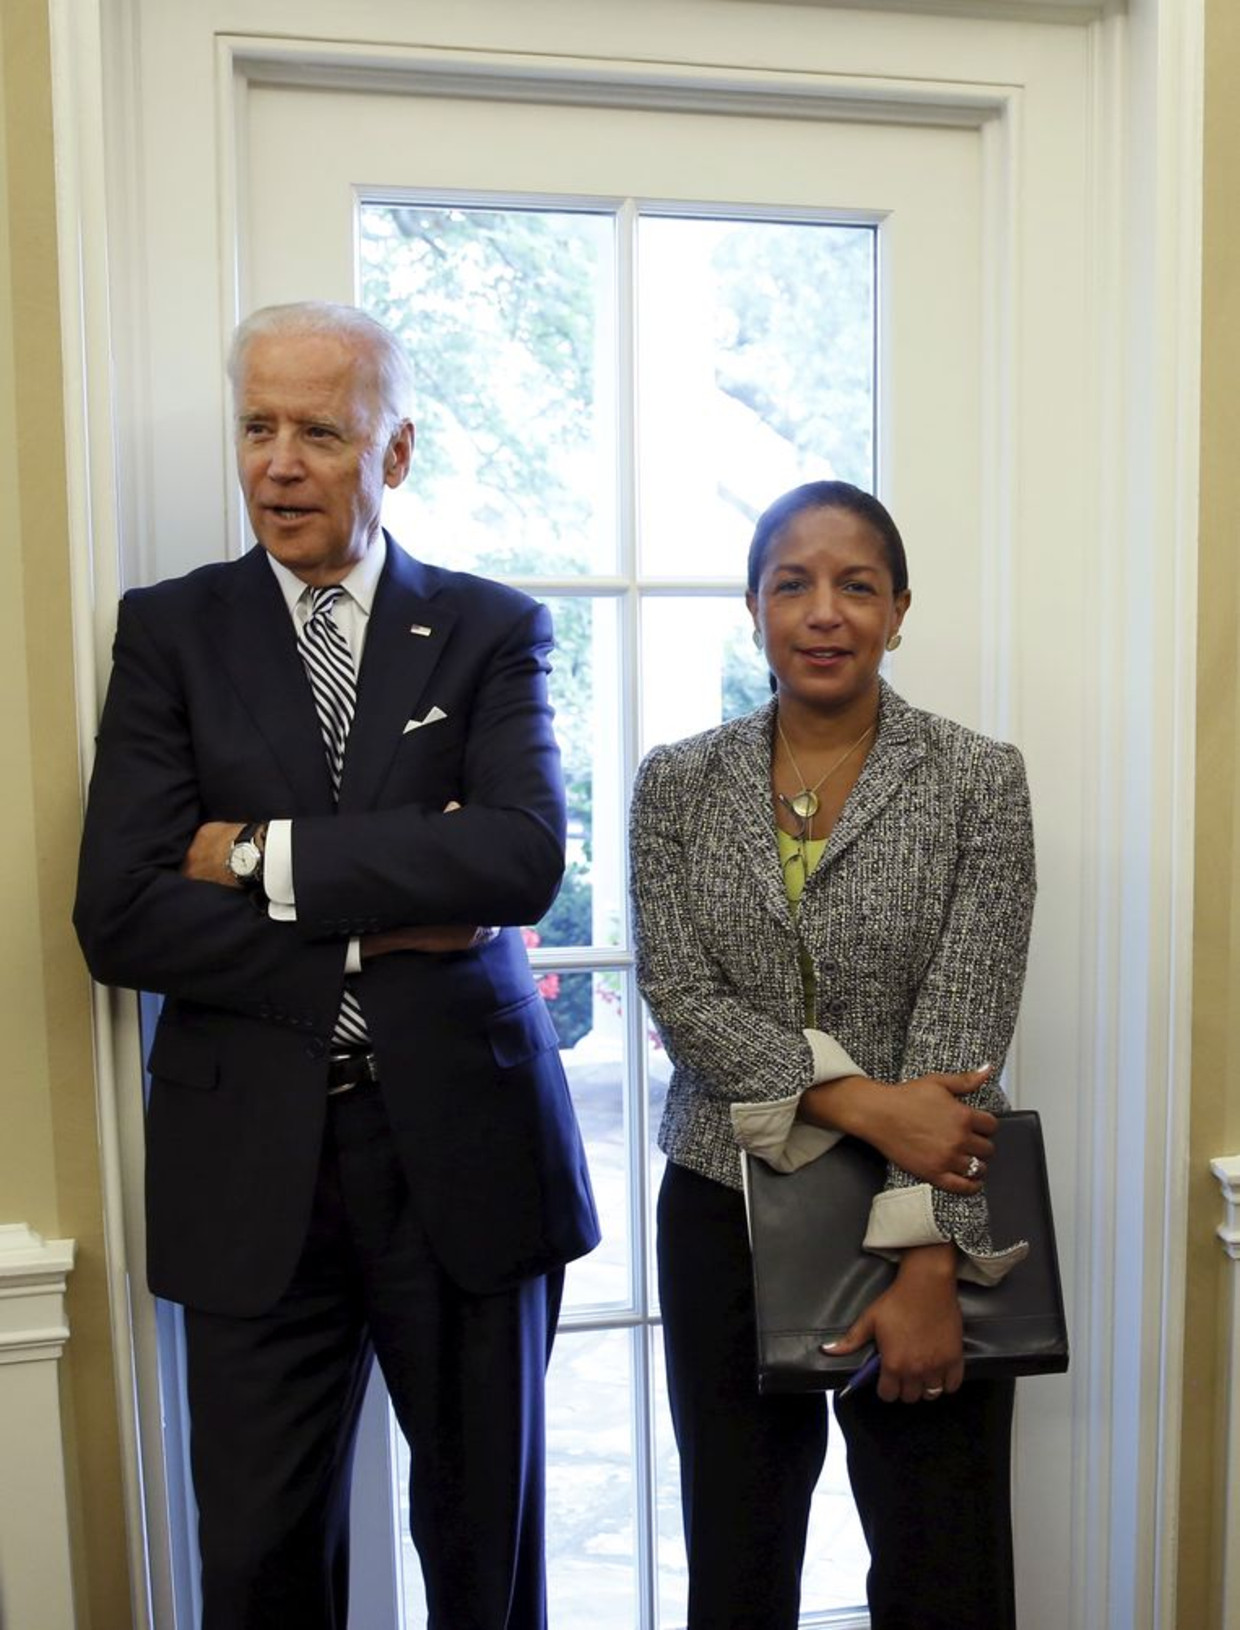 Joe Biden naast voormalig Nationaal Veiligheidsadviseur Susan Rice. Beeld REUTERS